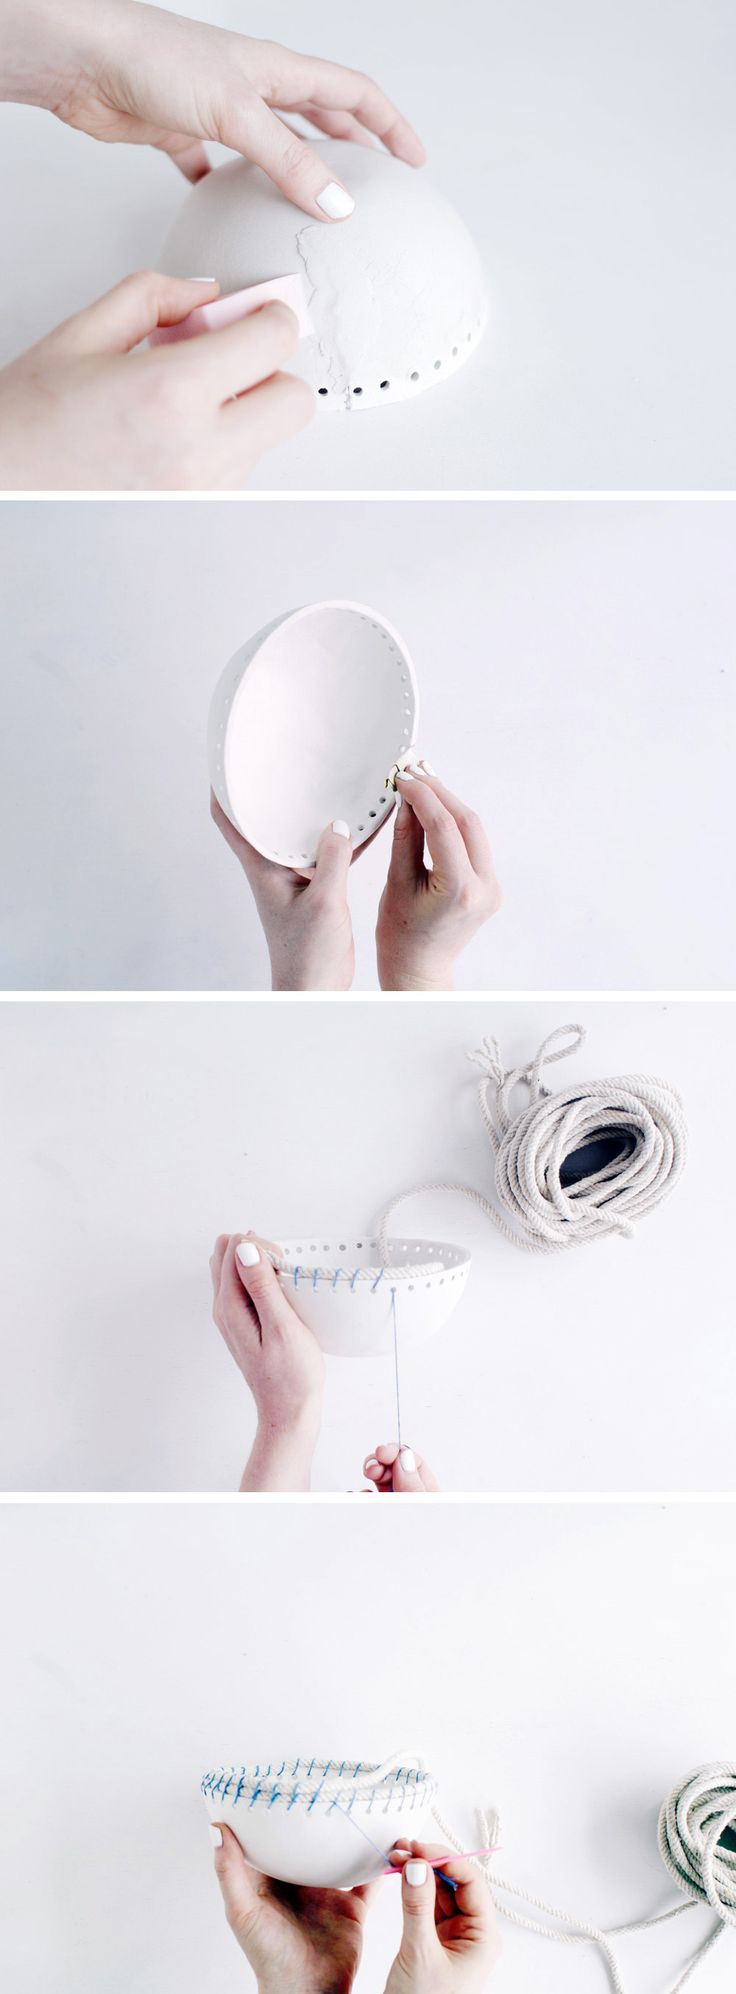 DIY Clay & Rope Pot | Fall For DIY //Manbo